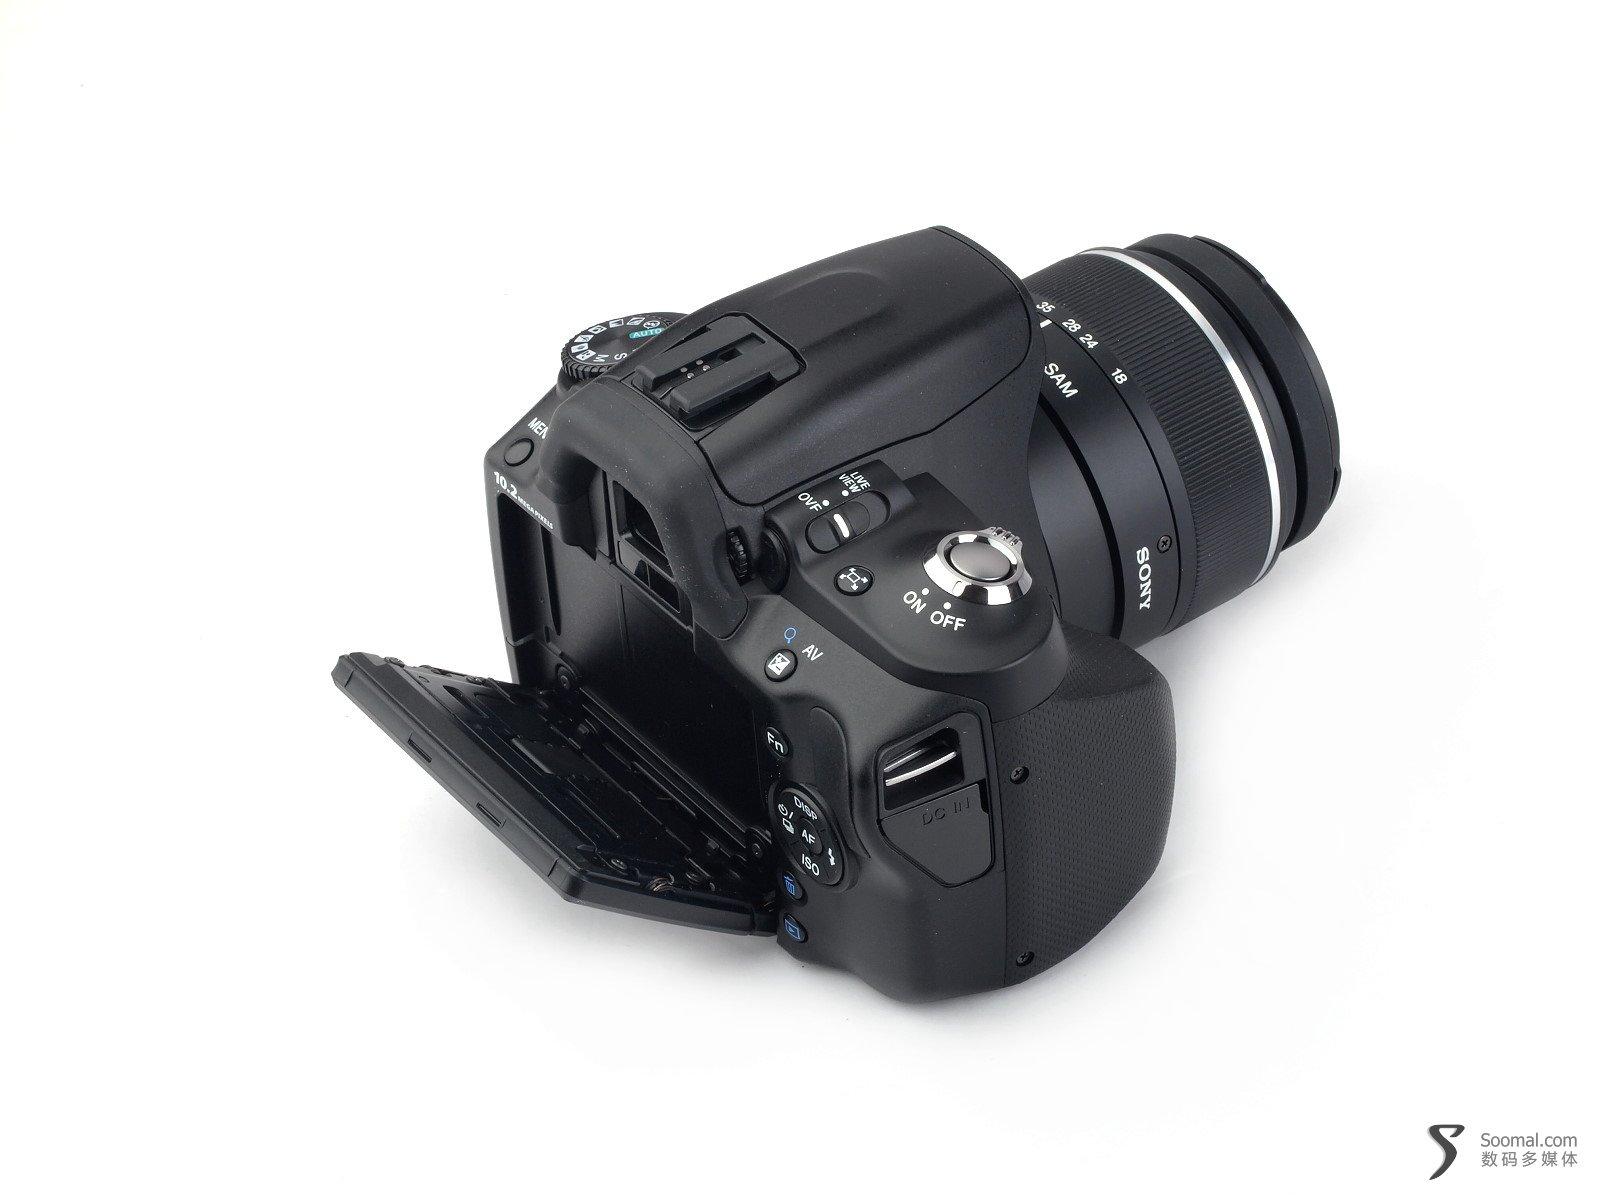 sony 索尼 dslr-a330 数位单眼相机-荧幕可以翻转,高机位拍摄